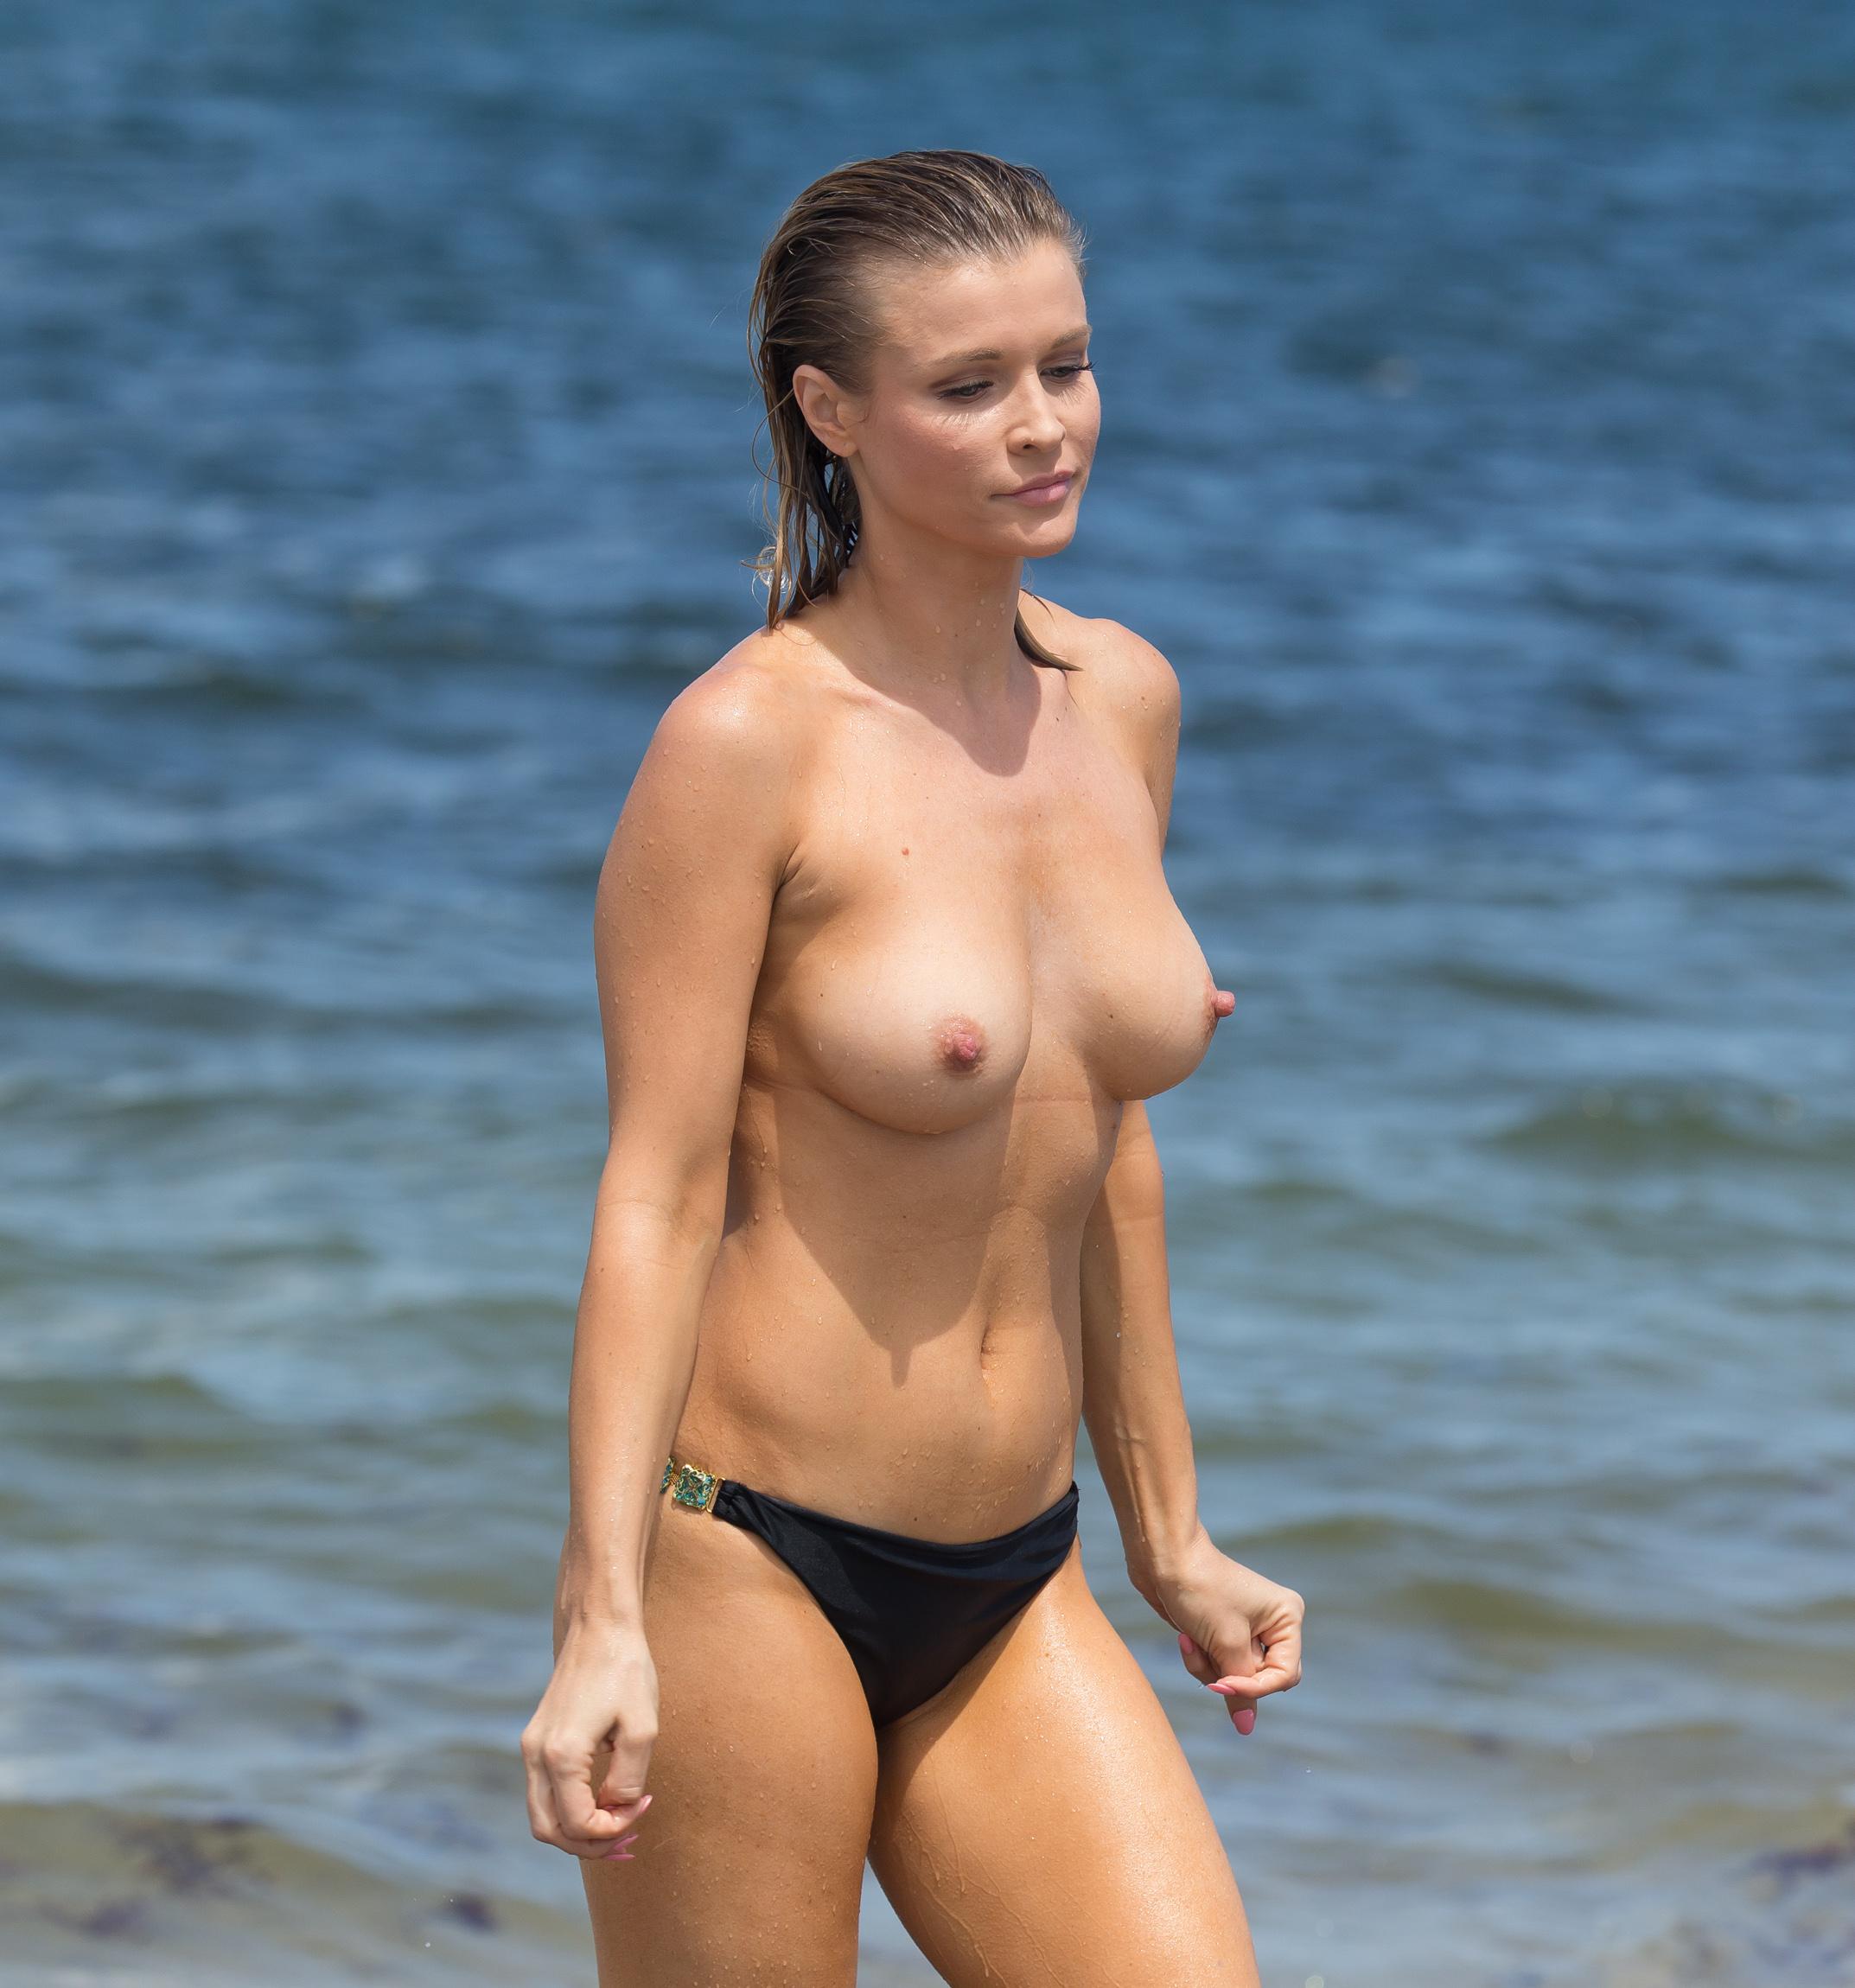 Joanna krupa topless photo new pics